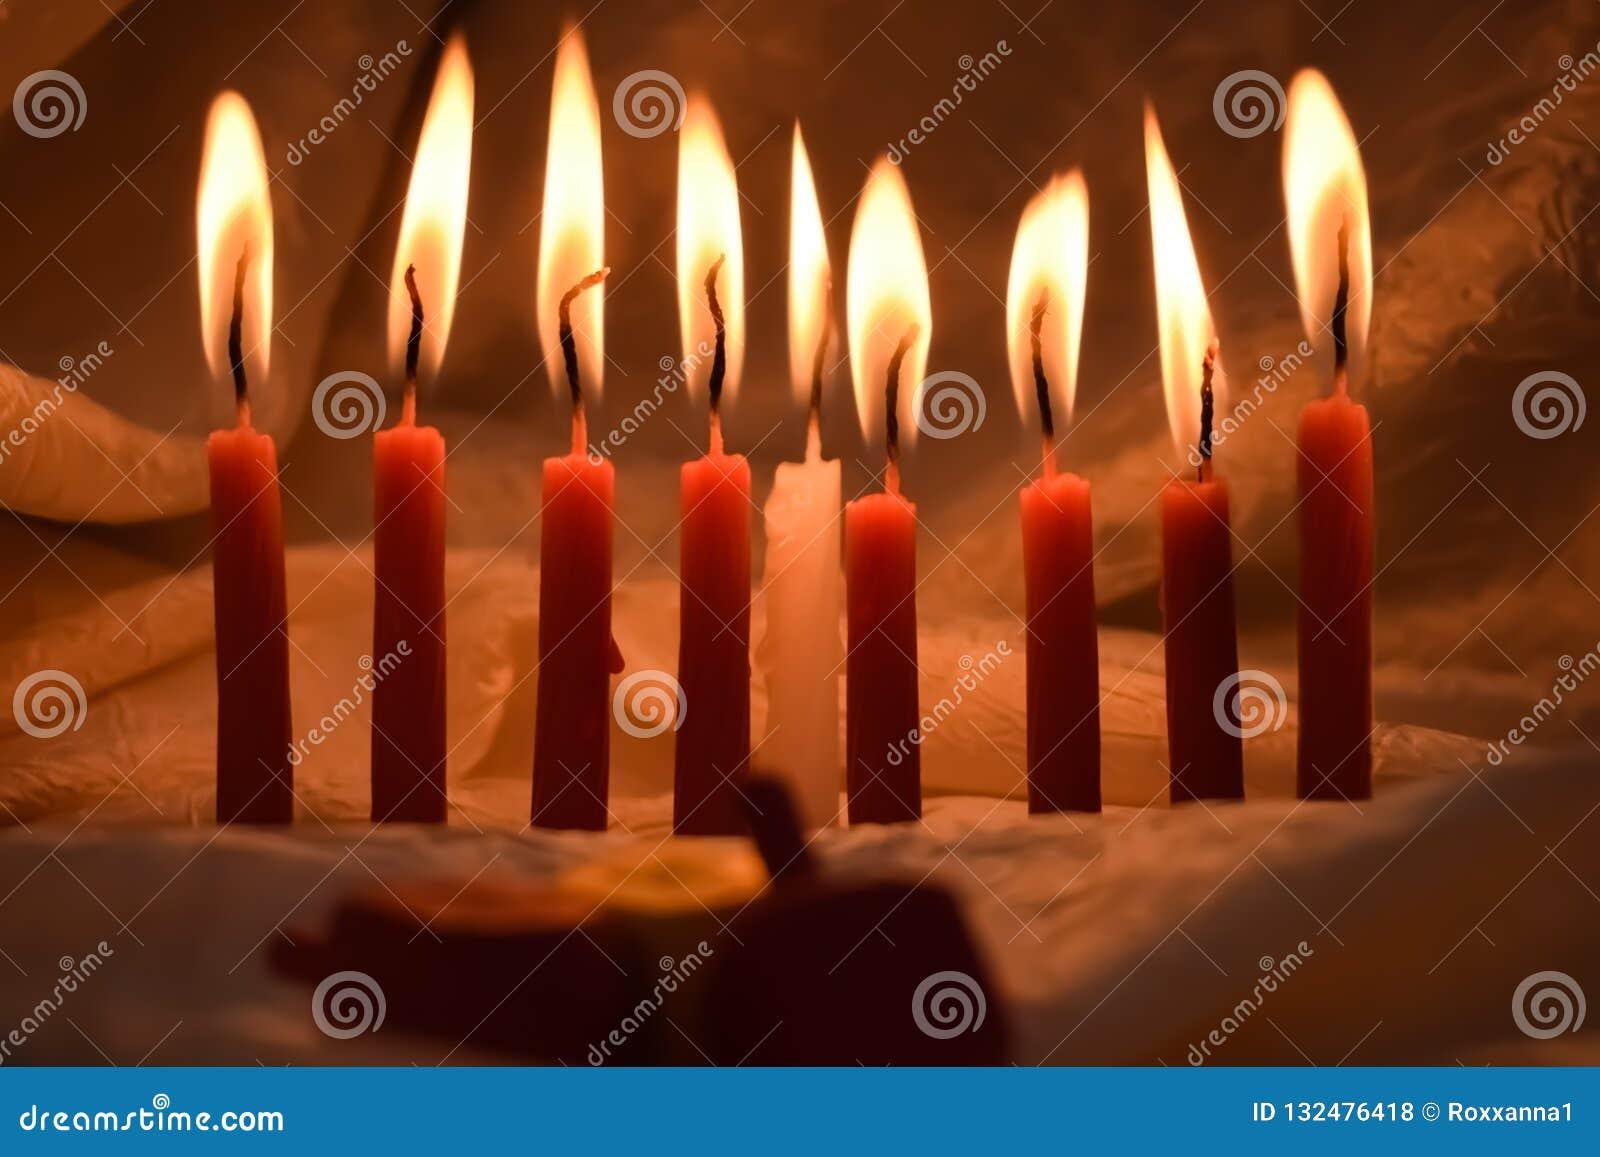 Hanukkah candles lit in the dark